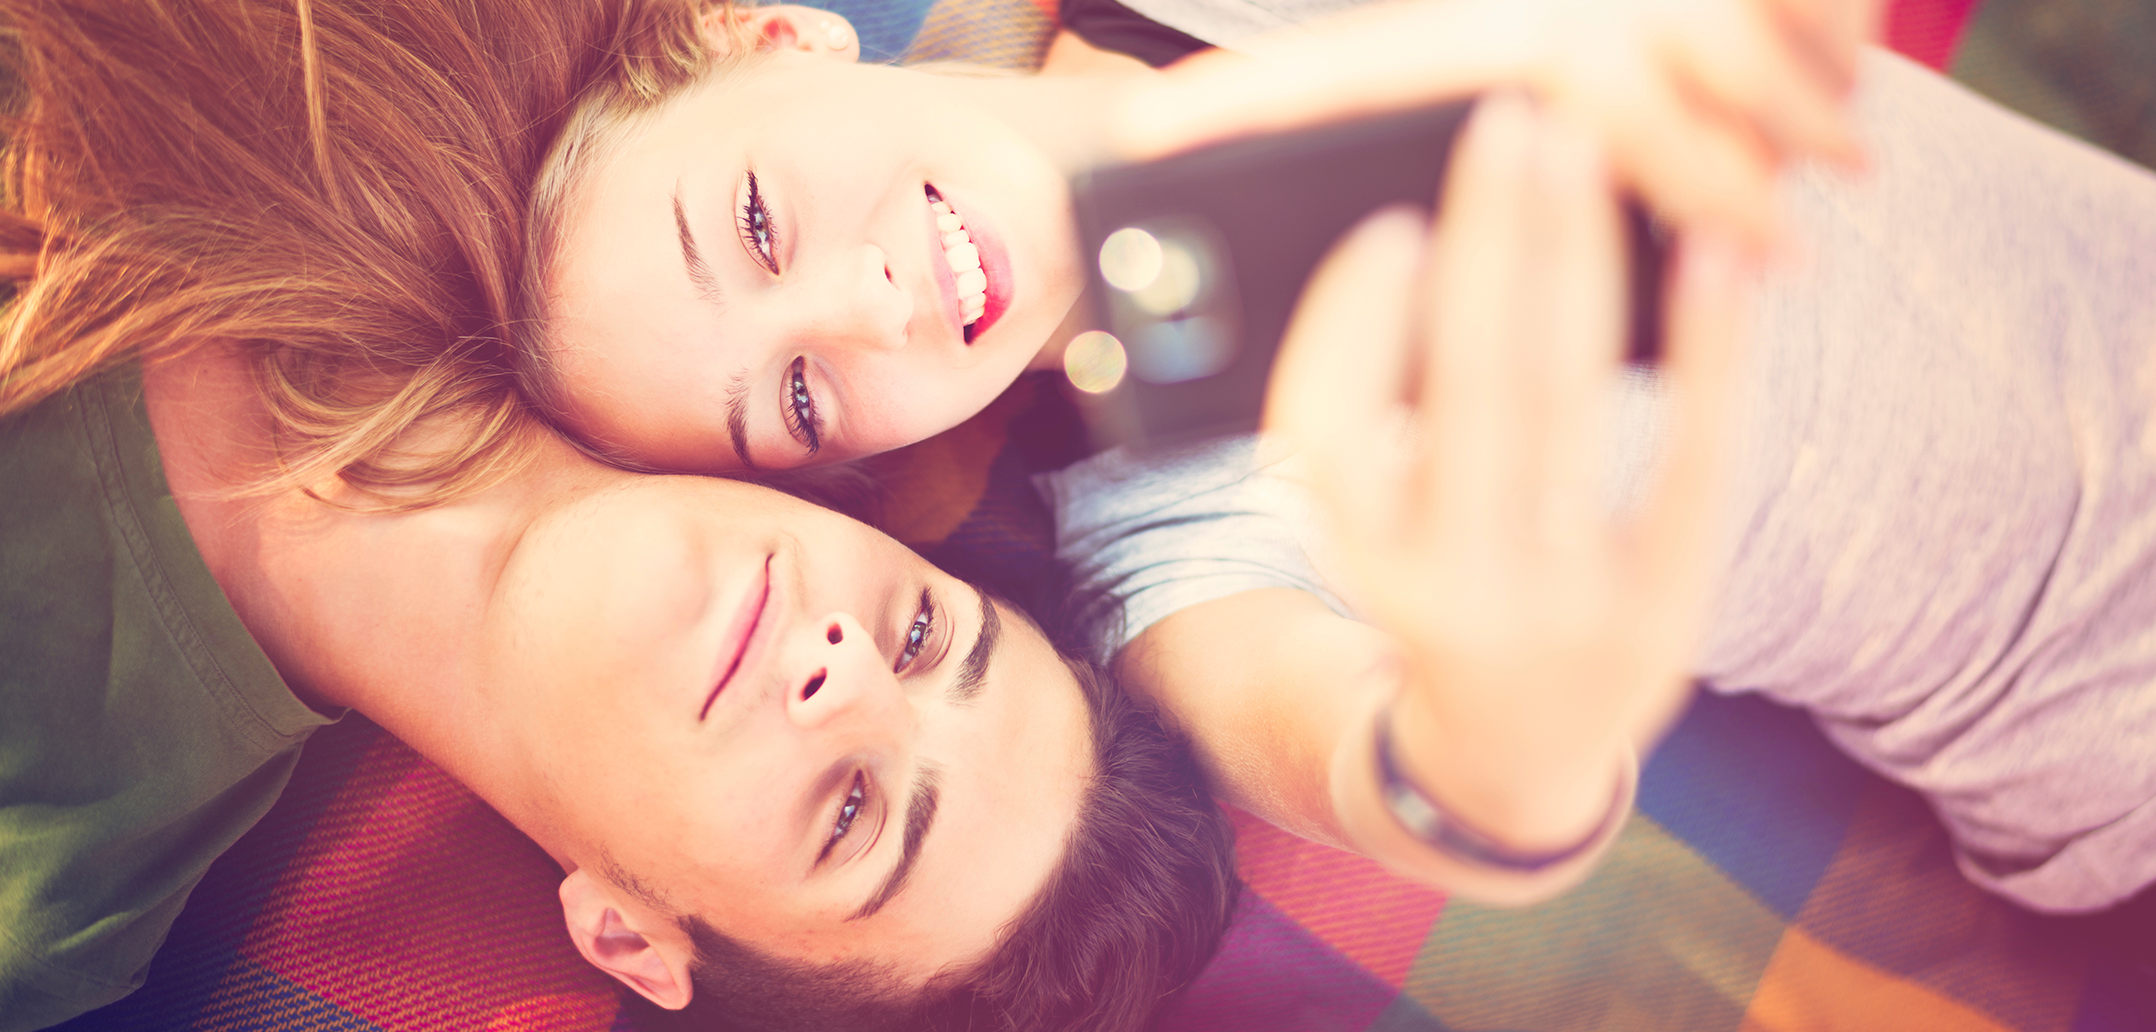 Beste langfristige Beziehung Dating-Website